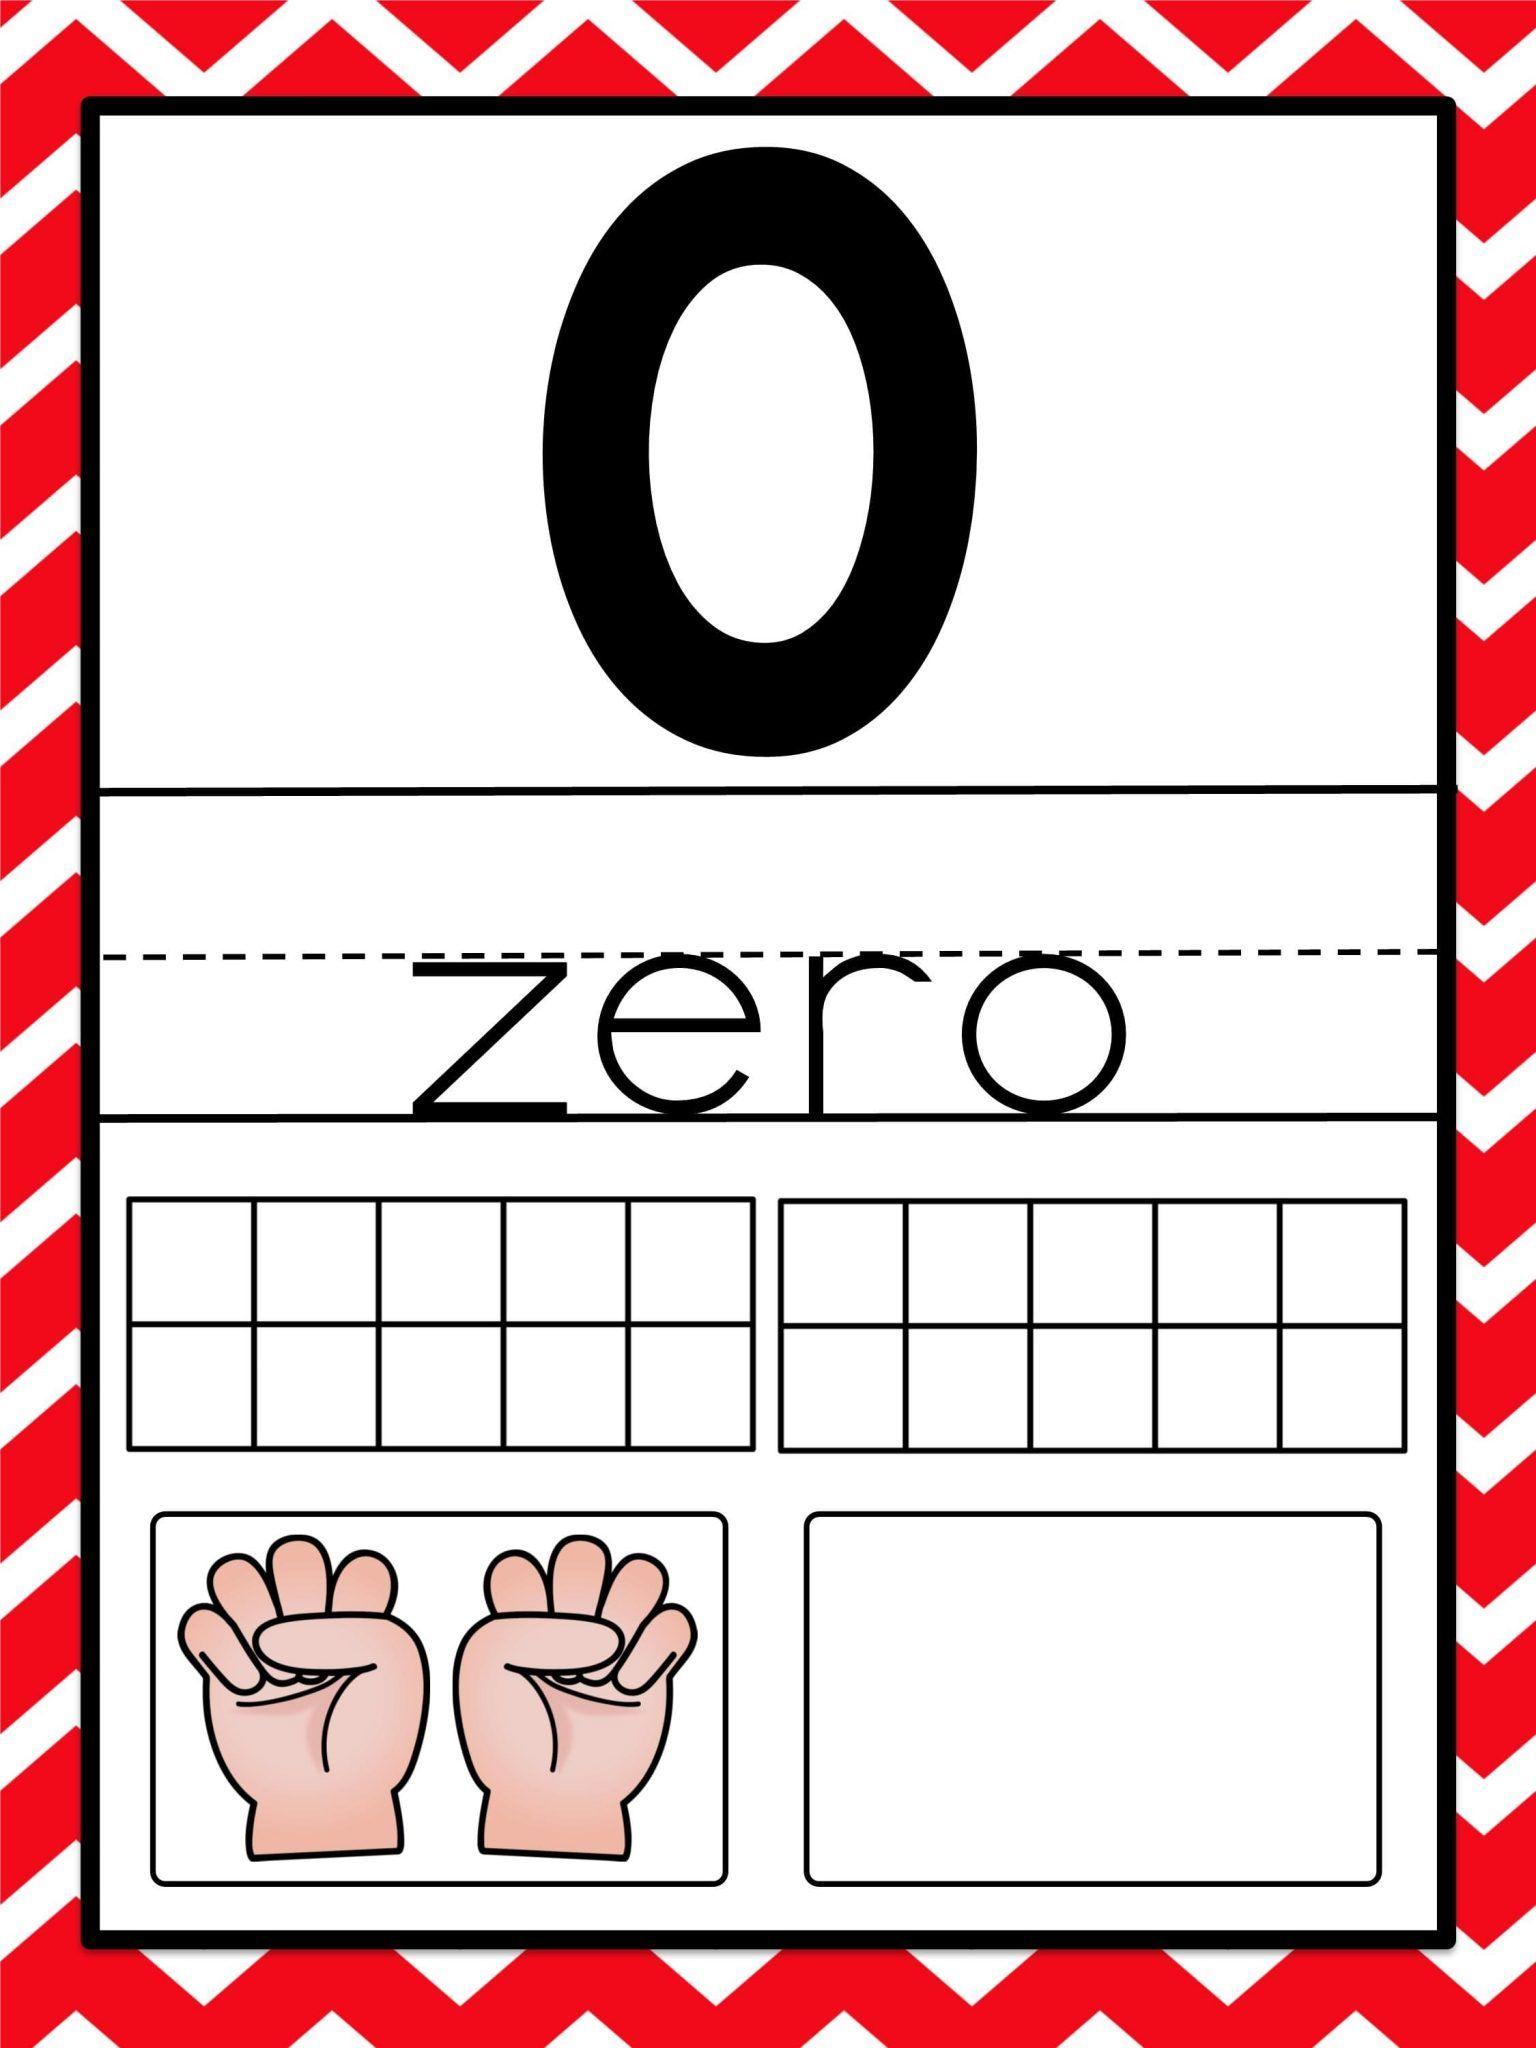 Numbers Posters لتعليم الاطفال الارقام باللغة الانجليزية Words Word Search Puzzle Word Search